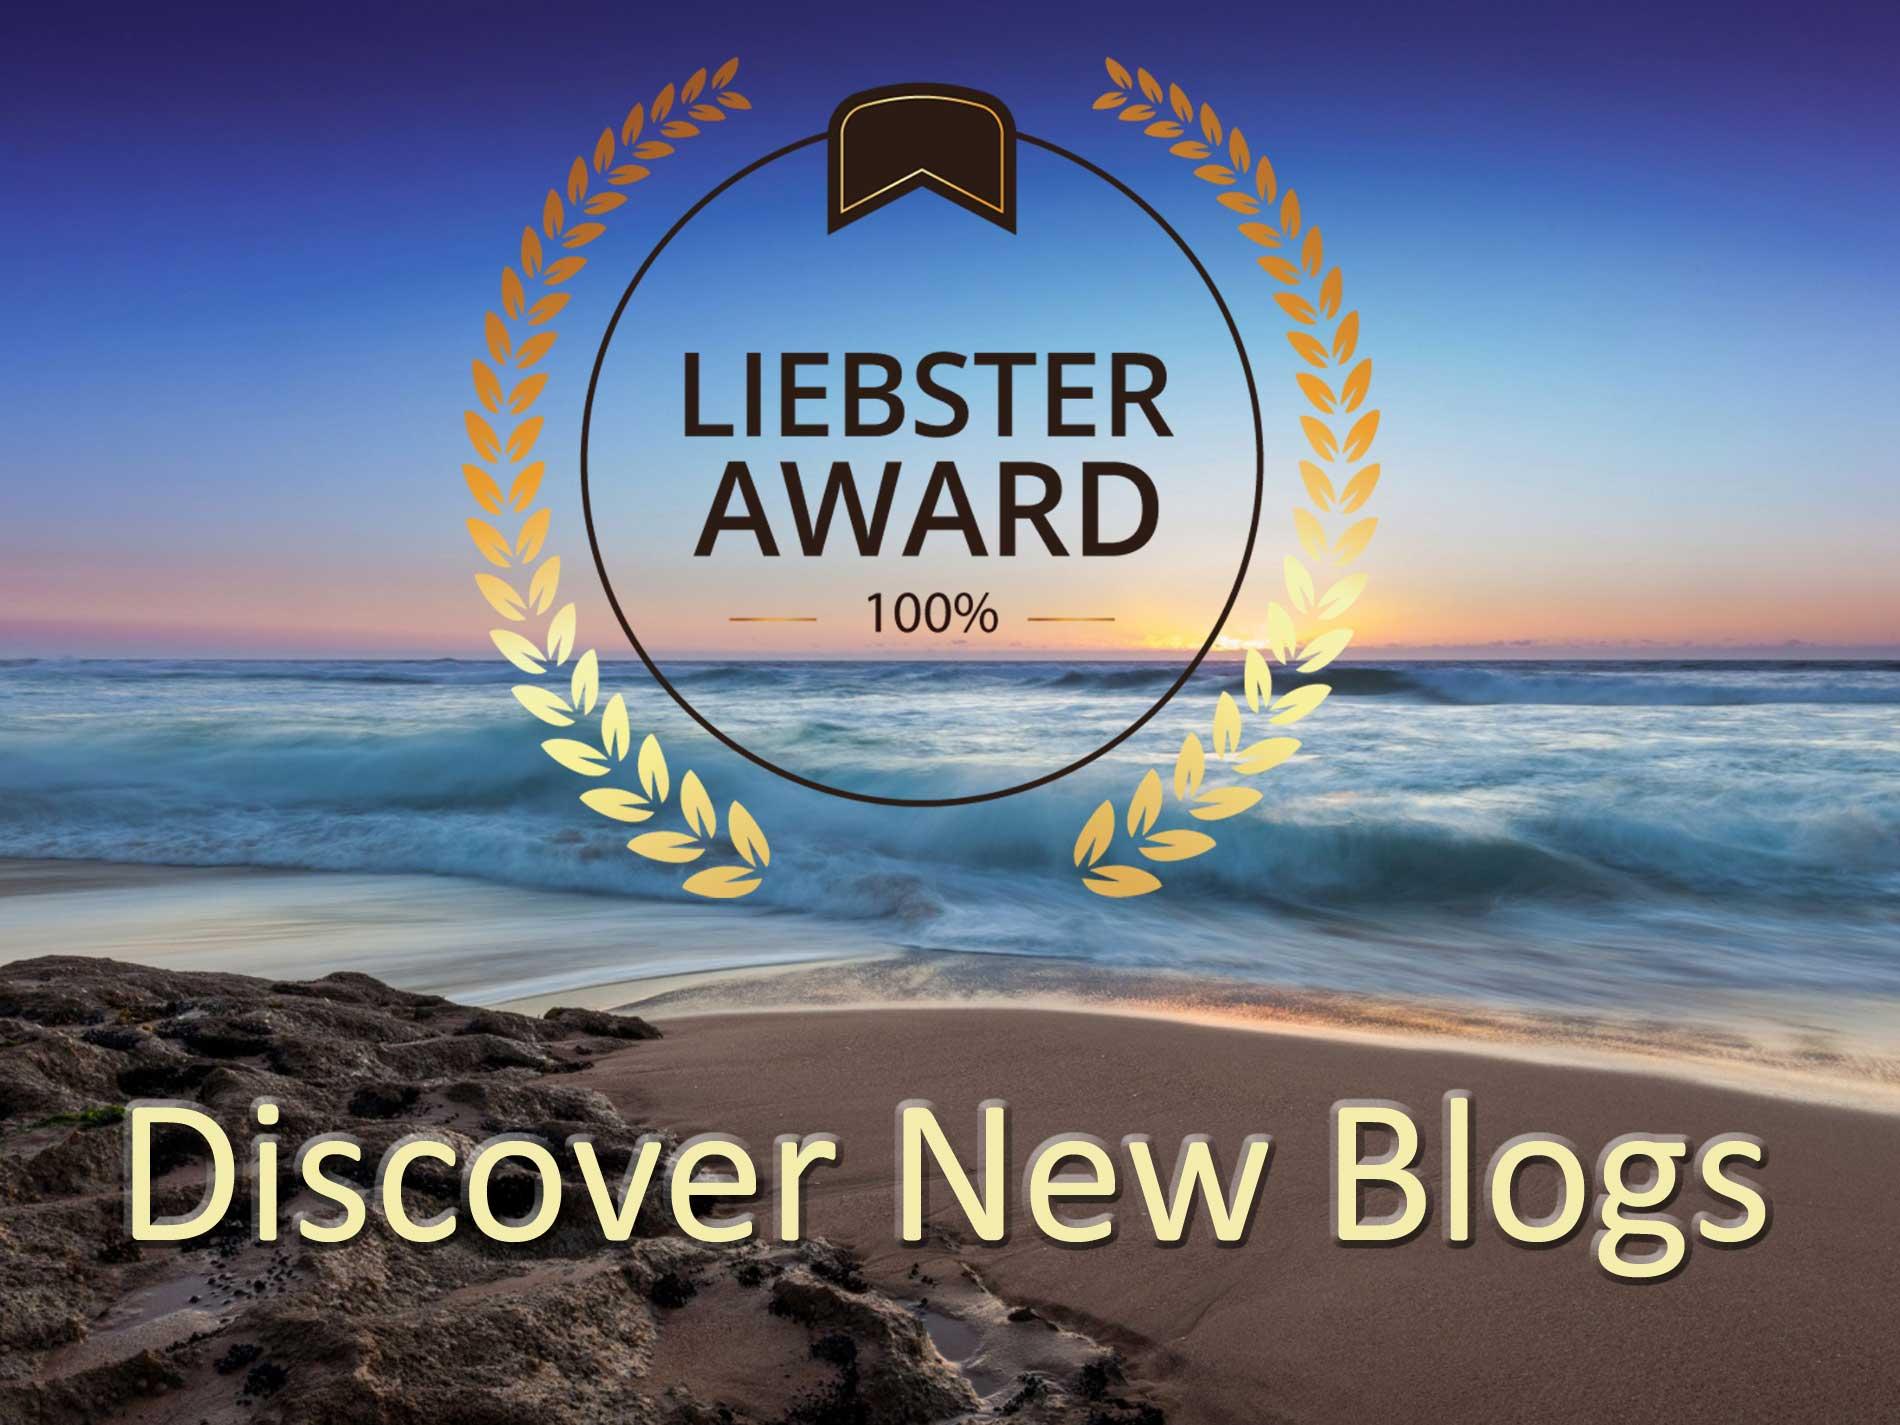 new blogger nomination award, liebster, travelesquelife